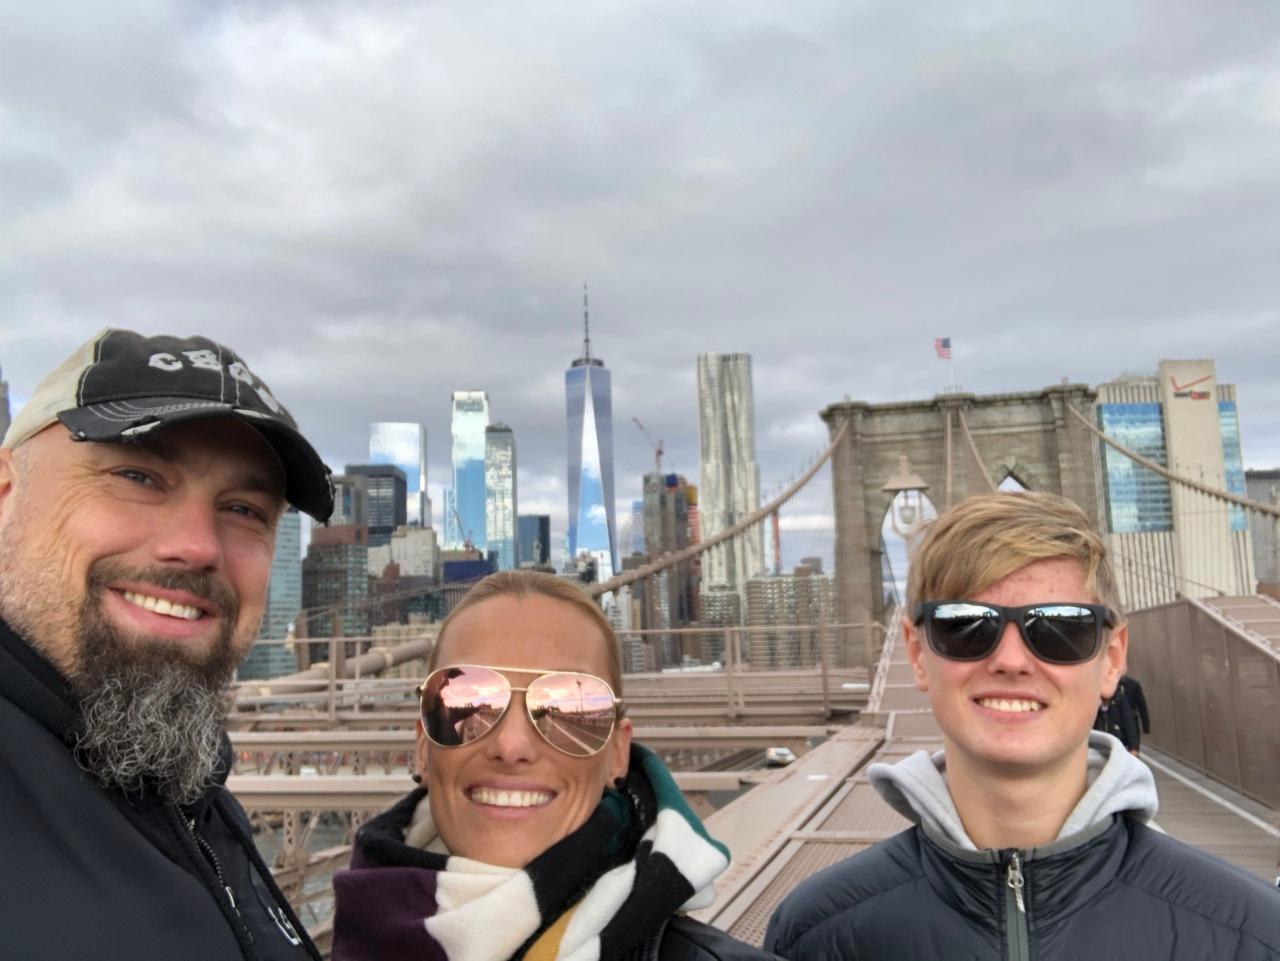 Brooklyn Bridge, walking New York's most iconic rivercrossing